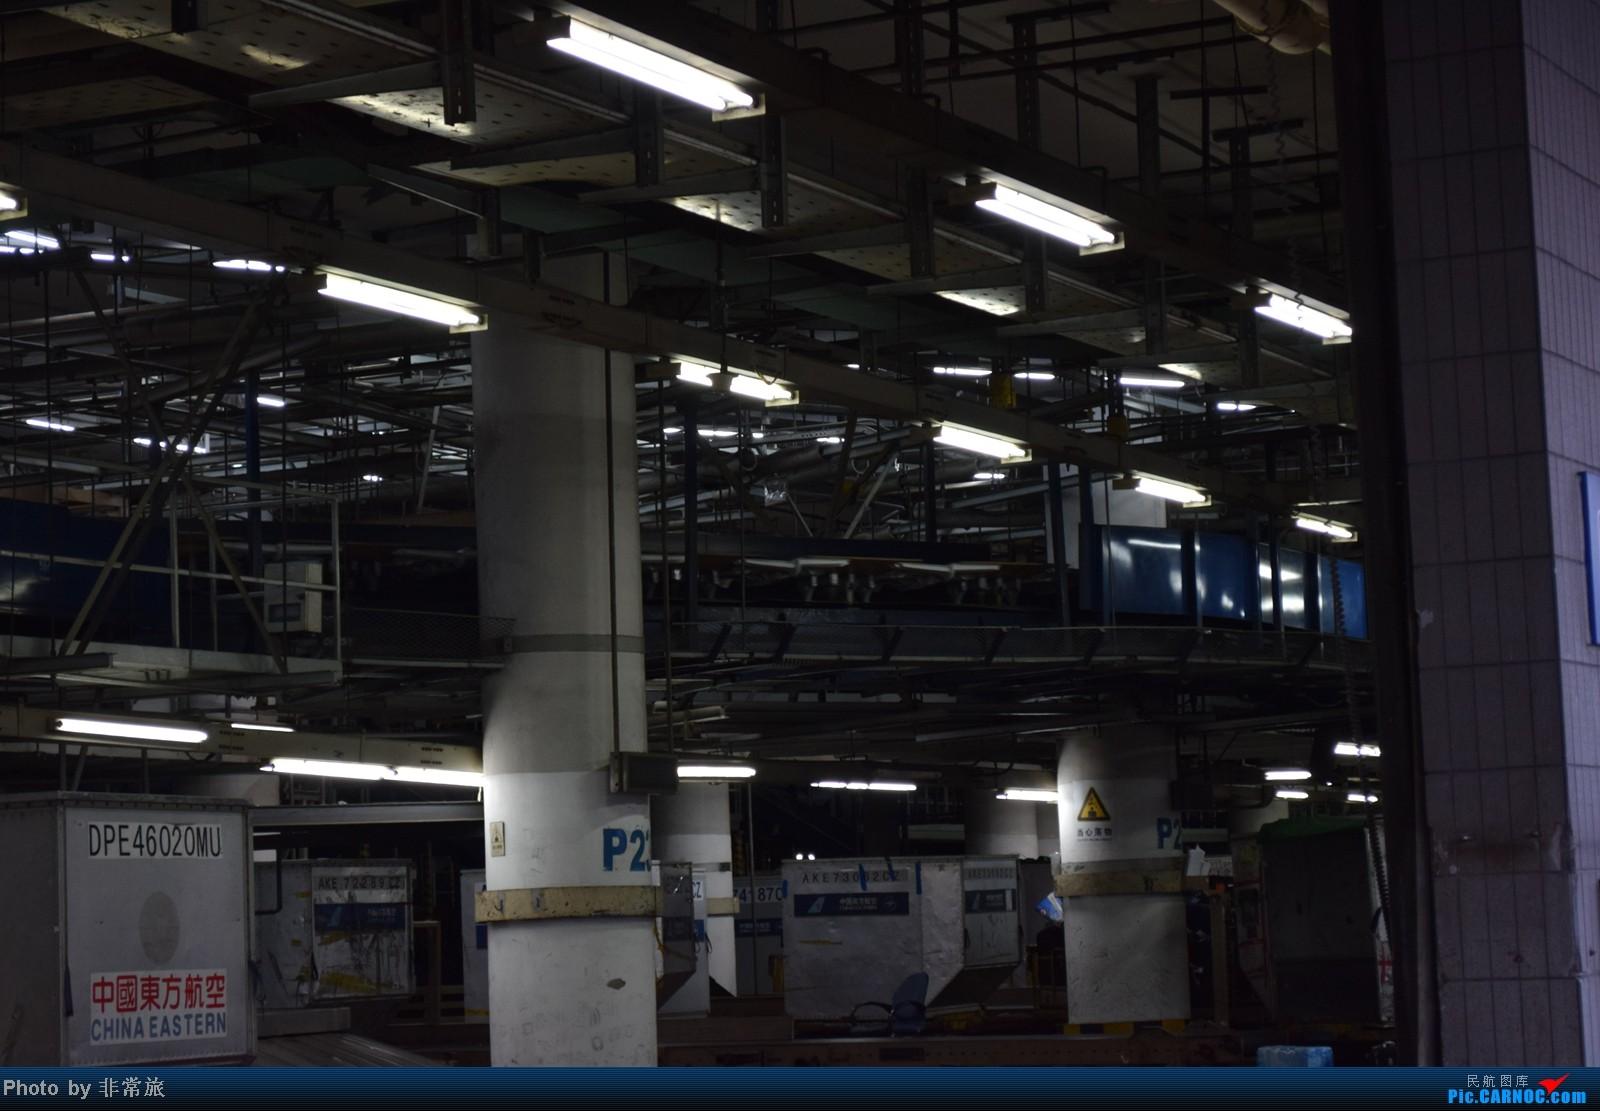 Re:[原创]大年三十除夕夜,三万英尺云霄间。 BOEING 787 B-2725 中国北京首都机场 中国北京首都机场